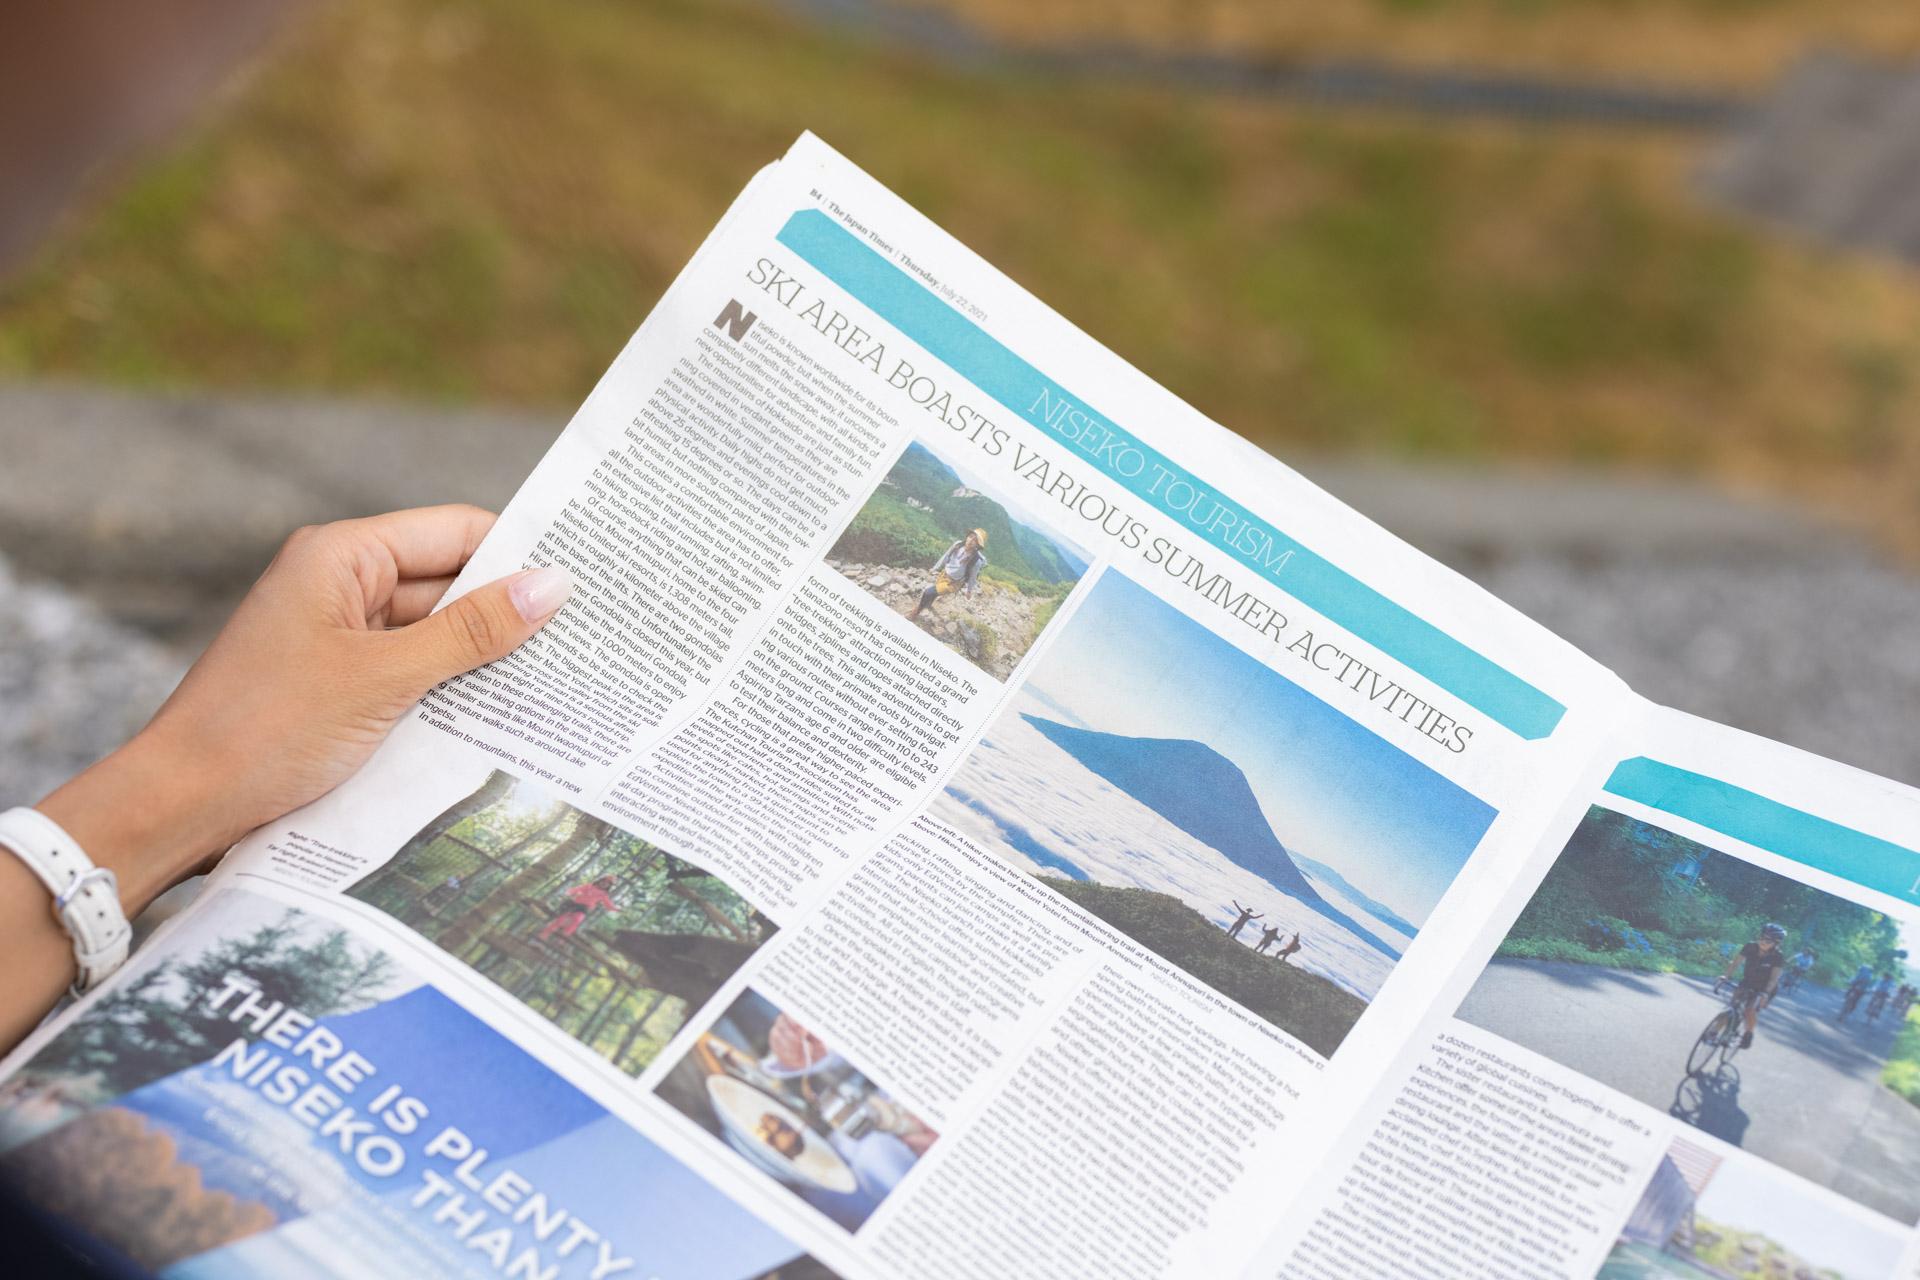 Japan Times Newspaper